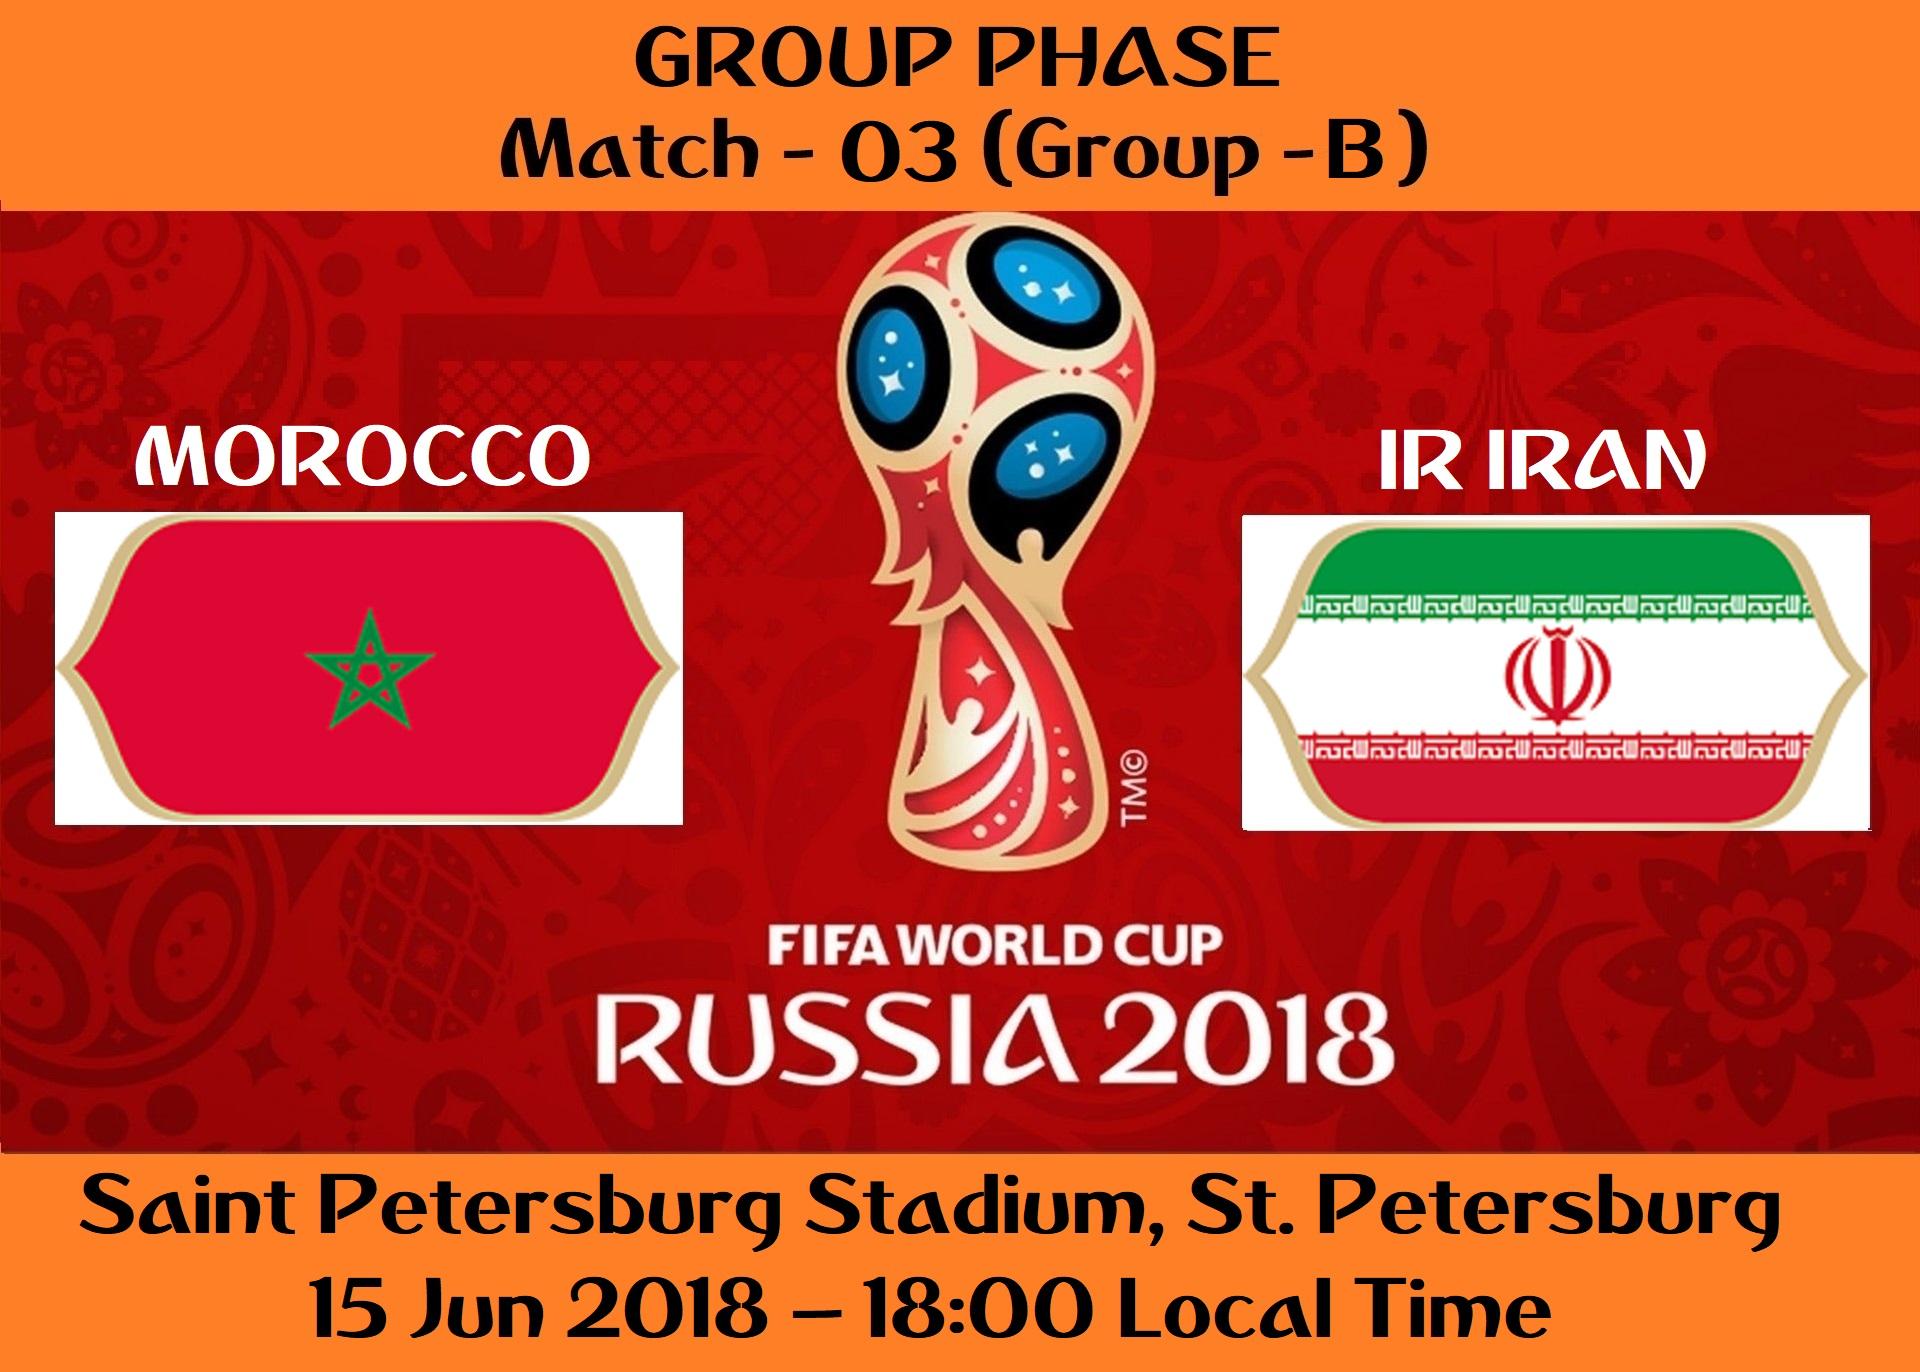 FIFA WORLD CUP 2018 MATCH - 3 - MOROCCO vs IR IRAN